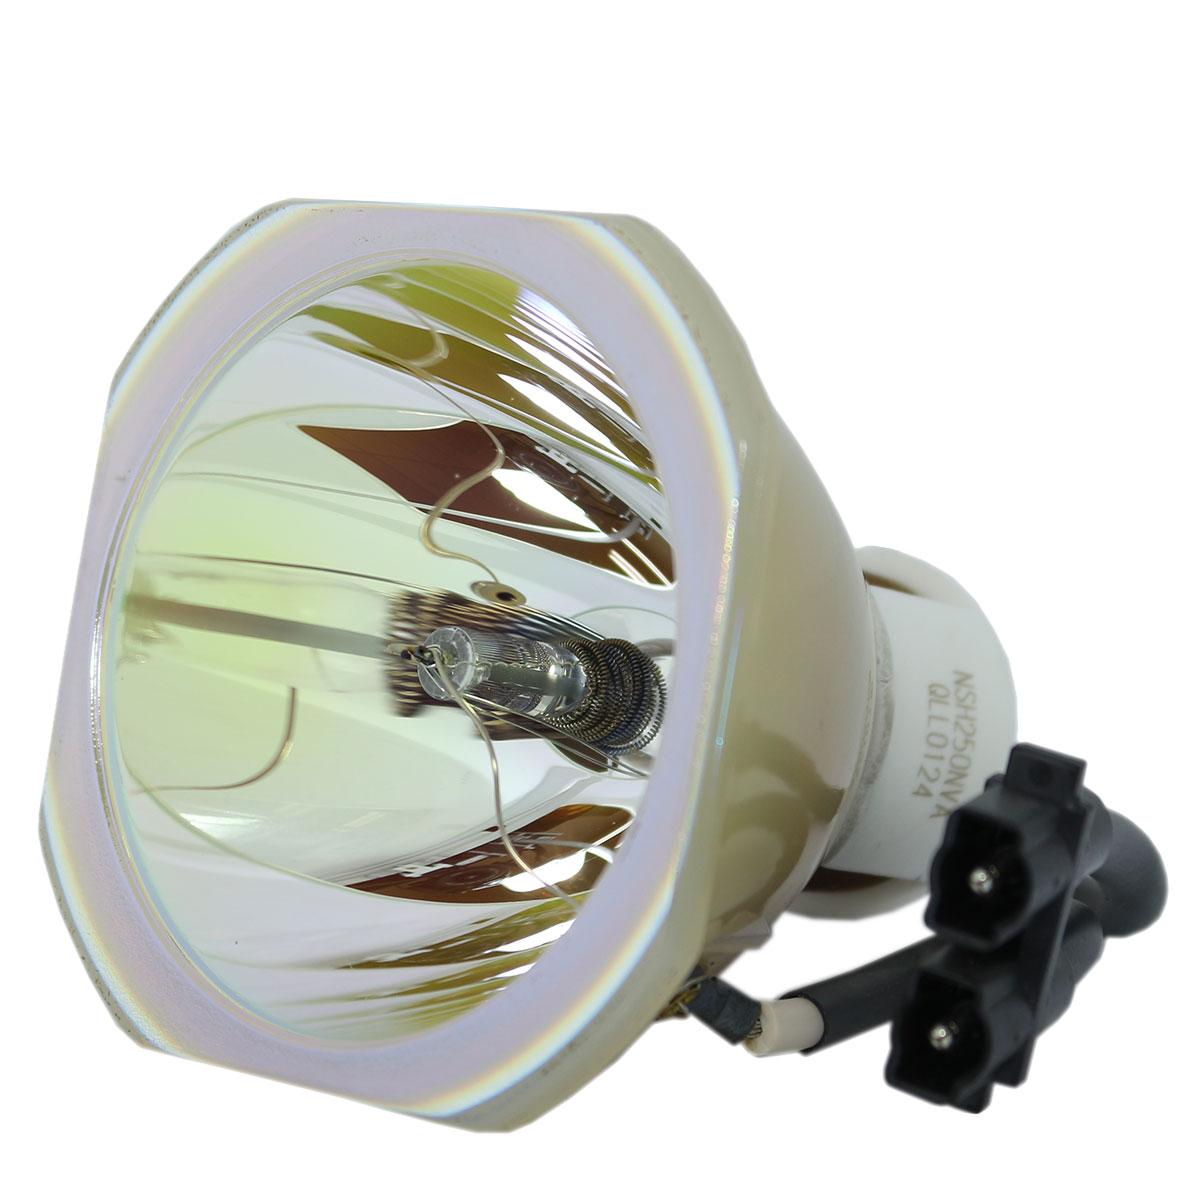 Compatible Bulb BHL-5006-S for JVC DLA-HD2/DLA-HD2KE/DLA-HD2KELD/DLA-HD2KSYS/DLA-HX1/DLA-HX2 Projector Bulb Lamp without housing sheffilton подцветочница sheffilton улыбка 3065 бронзовый антик